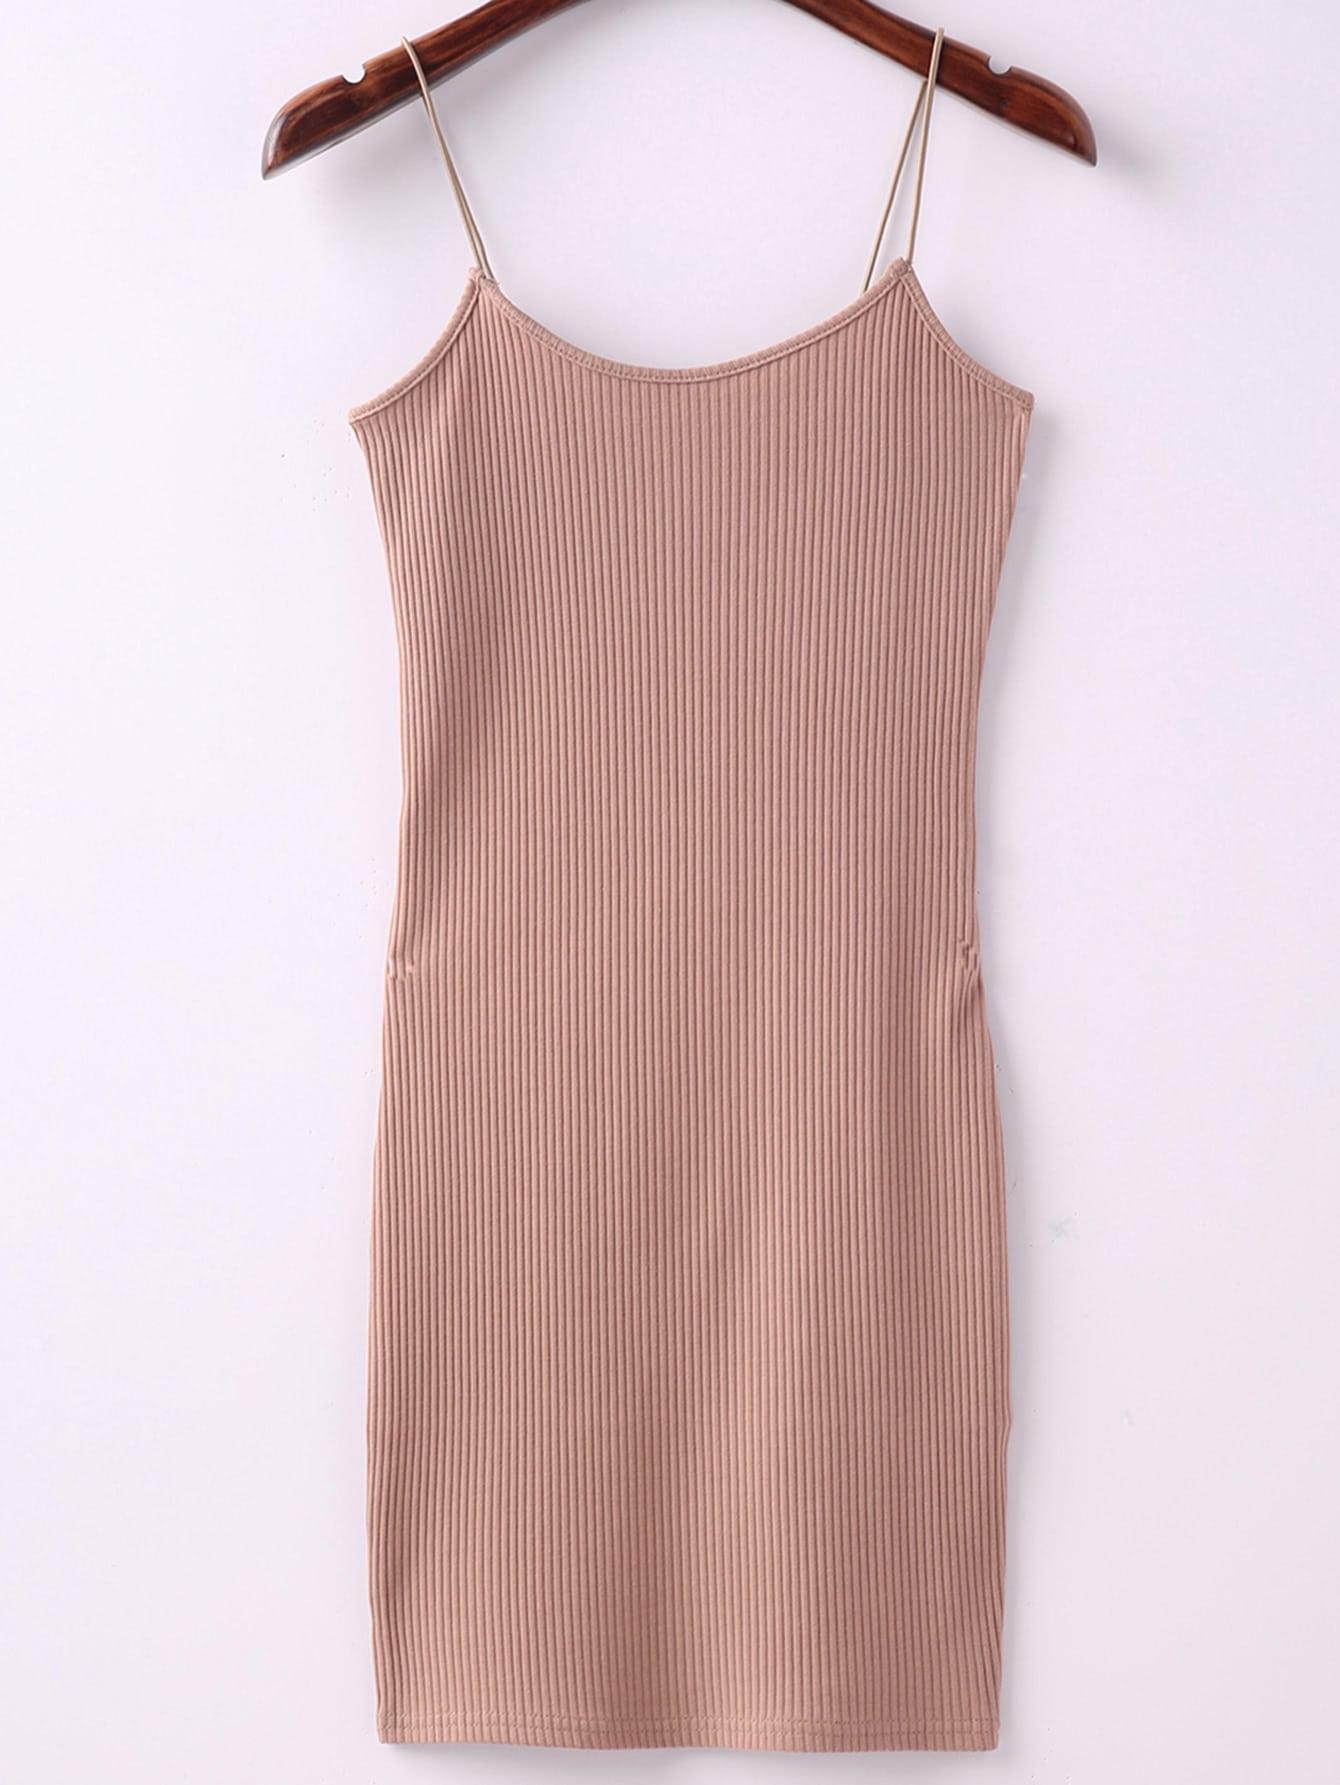 Khaki Ribbed Spaghetti Straps Sheath Dress dress160510206